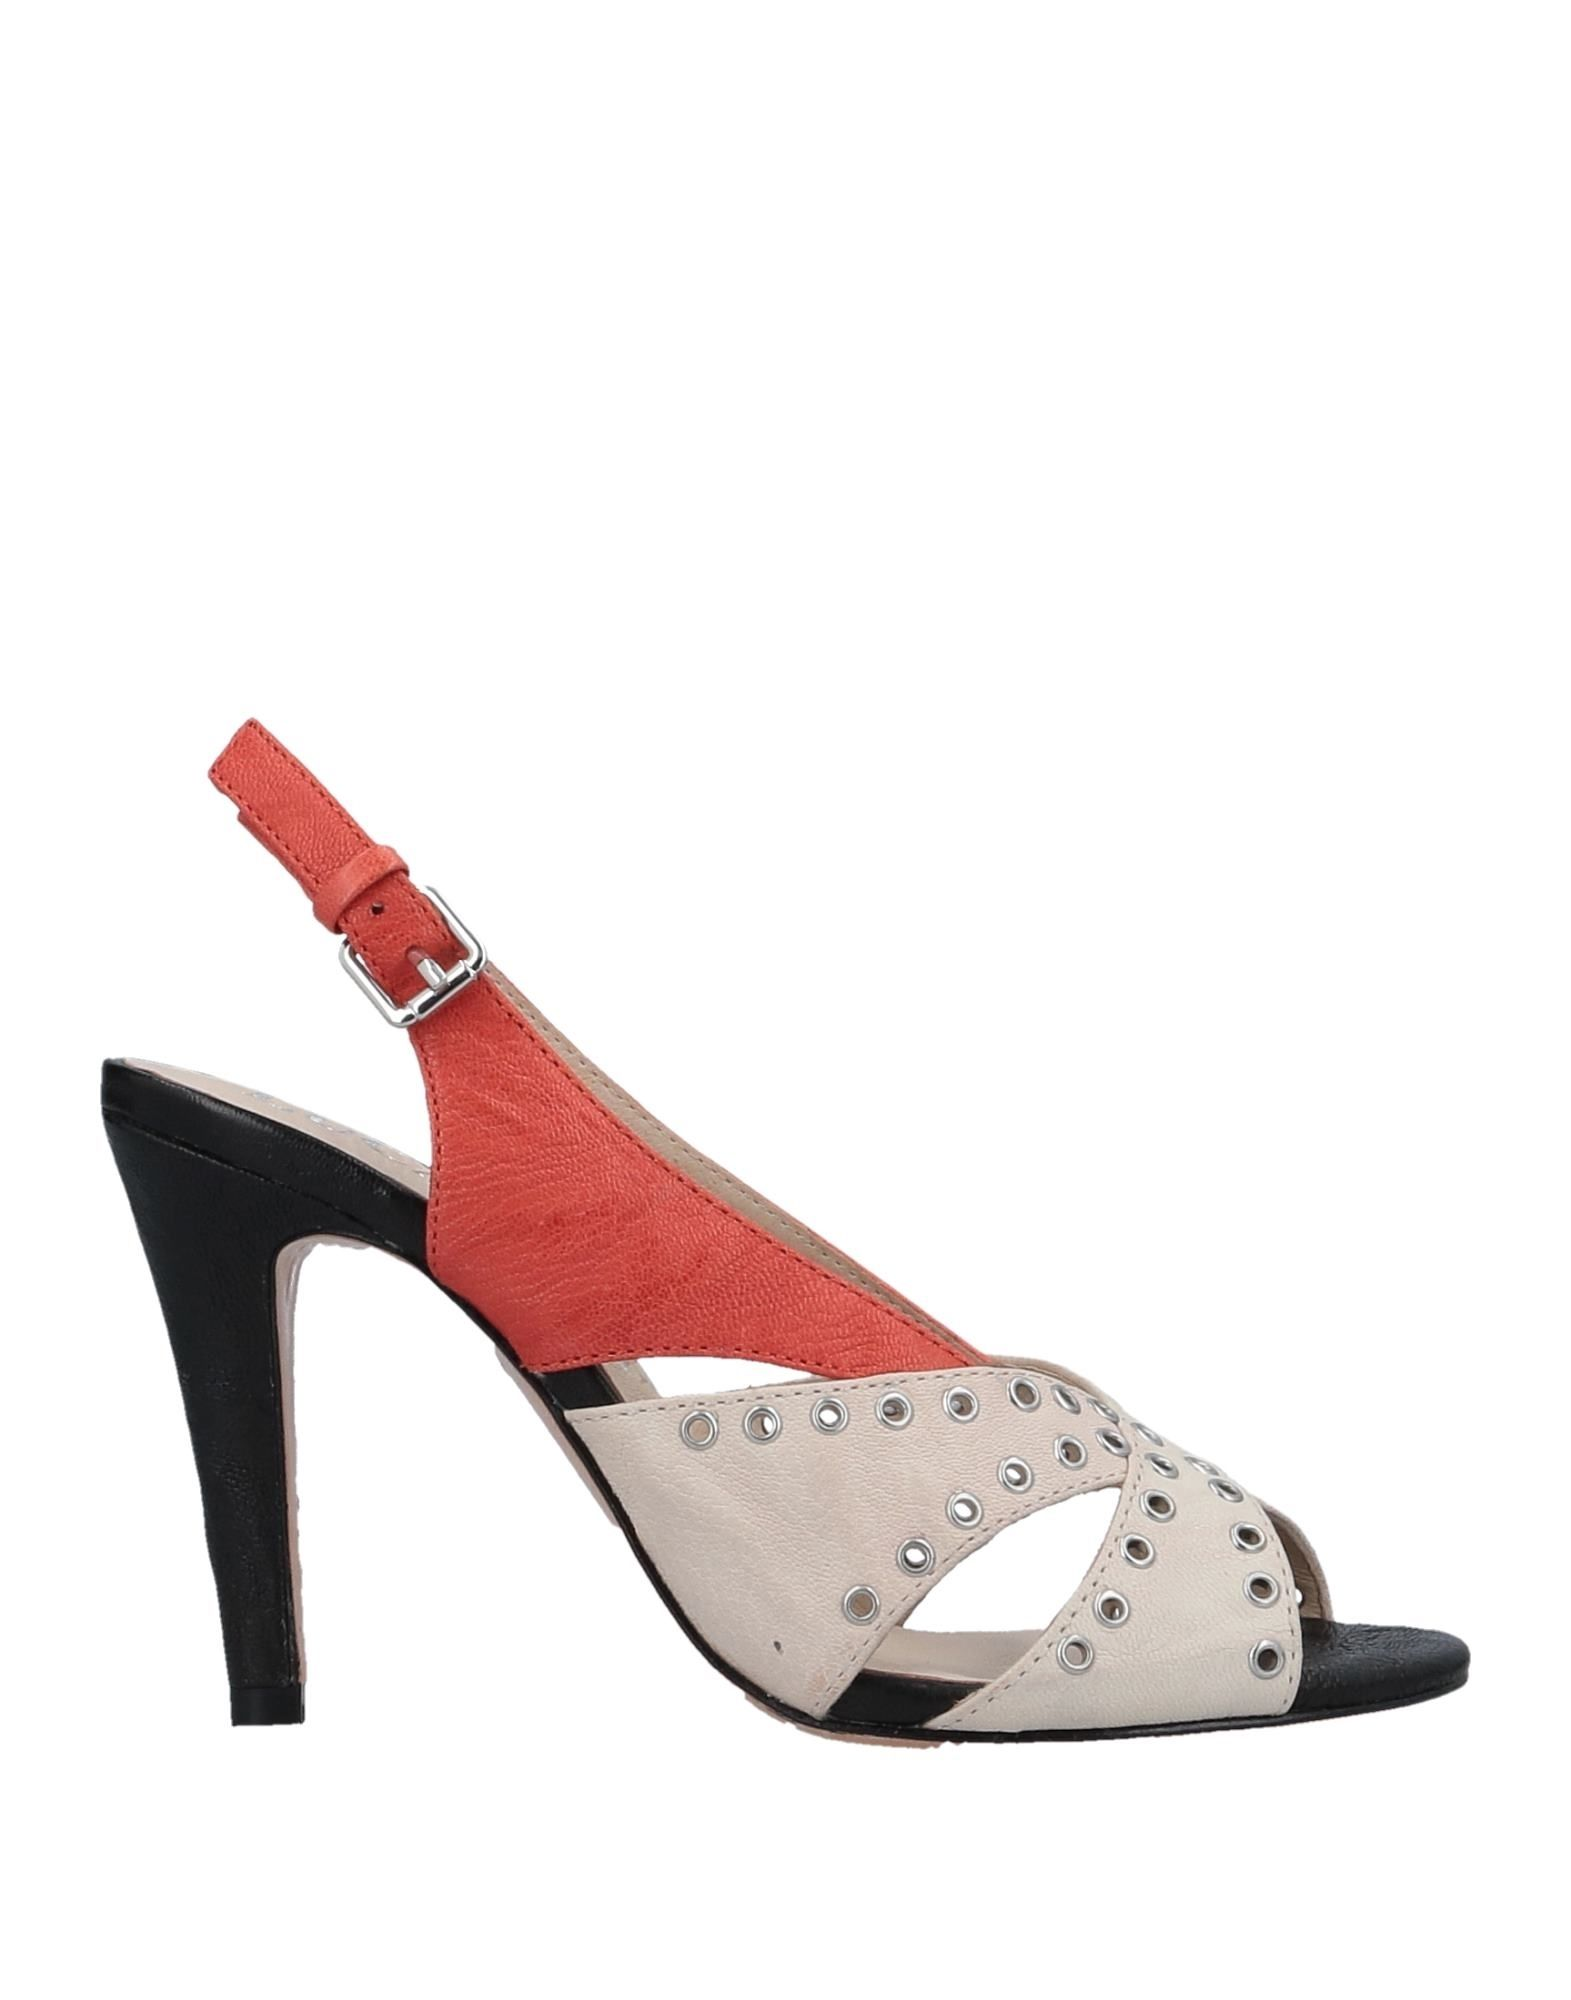 Luca Stefani Sandals - Women Luca Stefani Sandals online - on  United Kingdom - online 11512199BQ 5e4d51